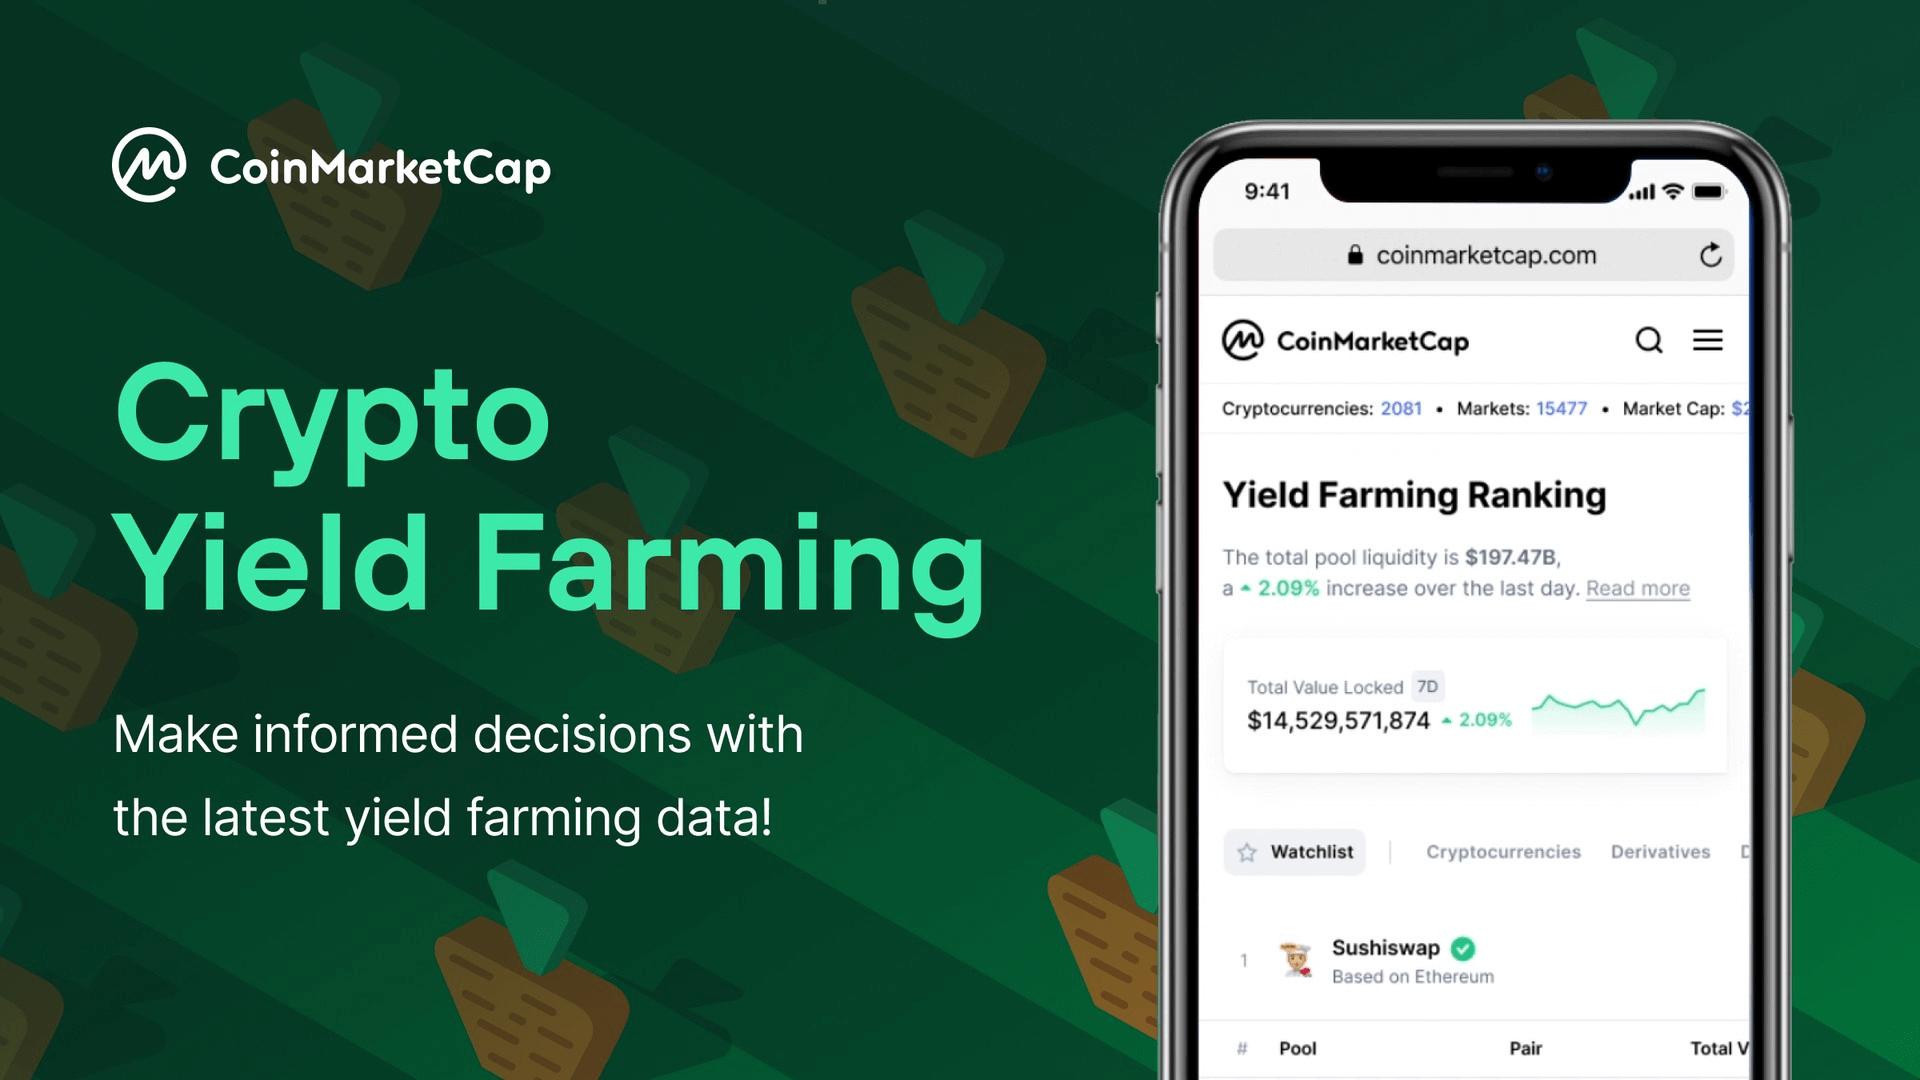 Aktuelle Krypto-DeFi-Yield Farming-Ranglisten   CoinMarketCap